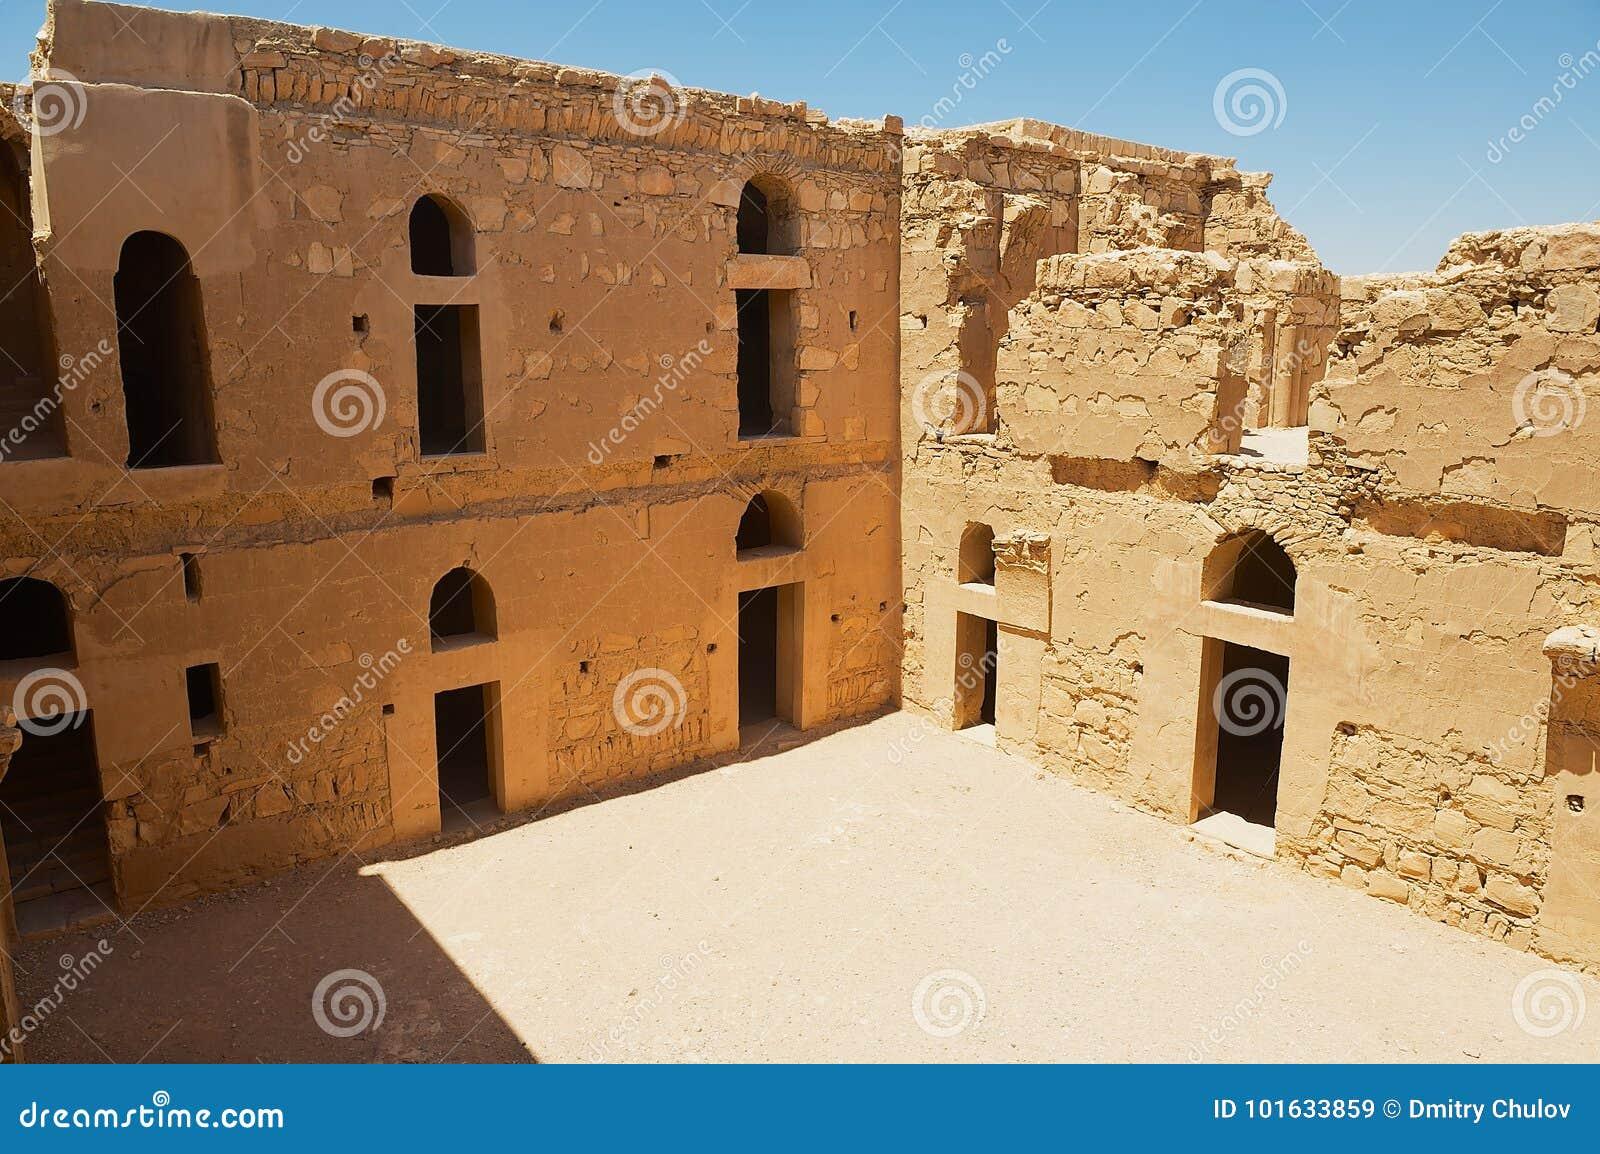 Iarda interna del castello abbandonato Qasr Kharana Kharanah o Harrana del deserto vicino ad Amman, Giordania